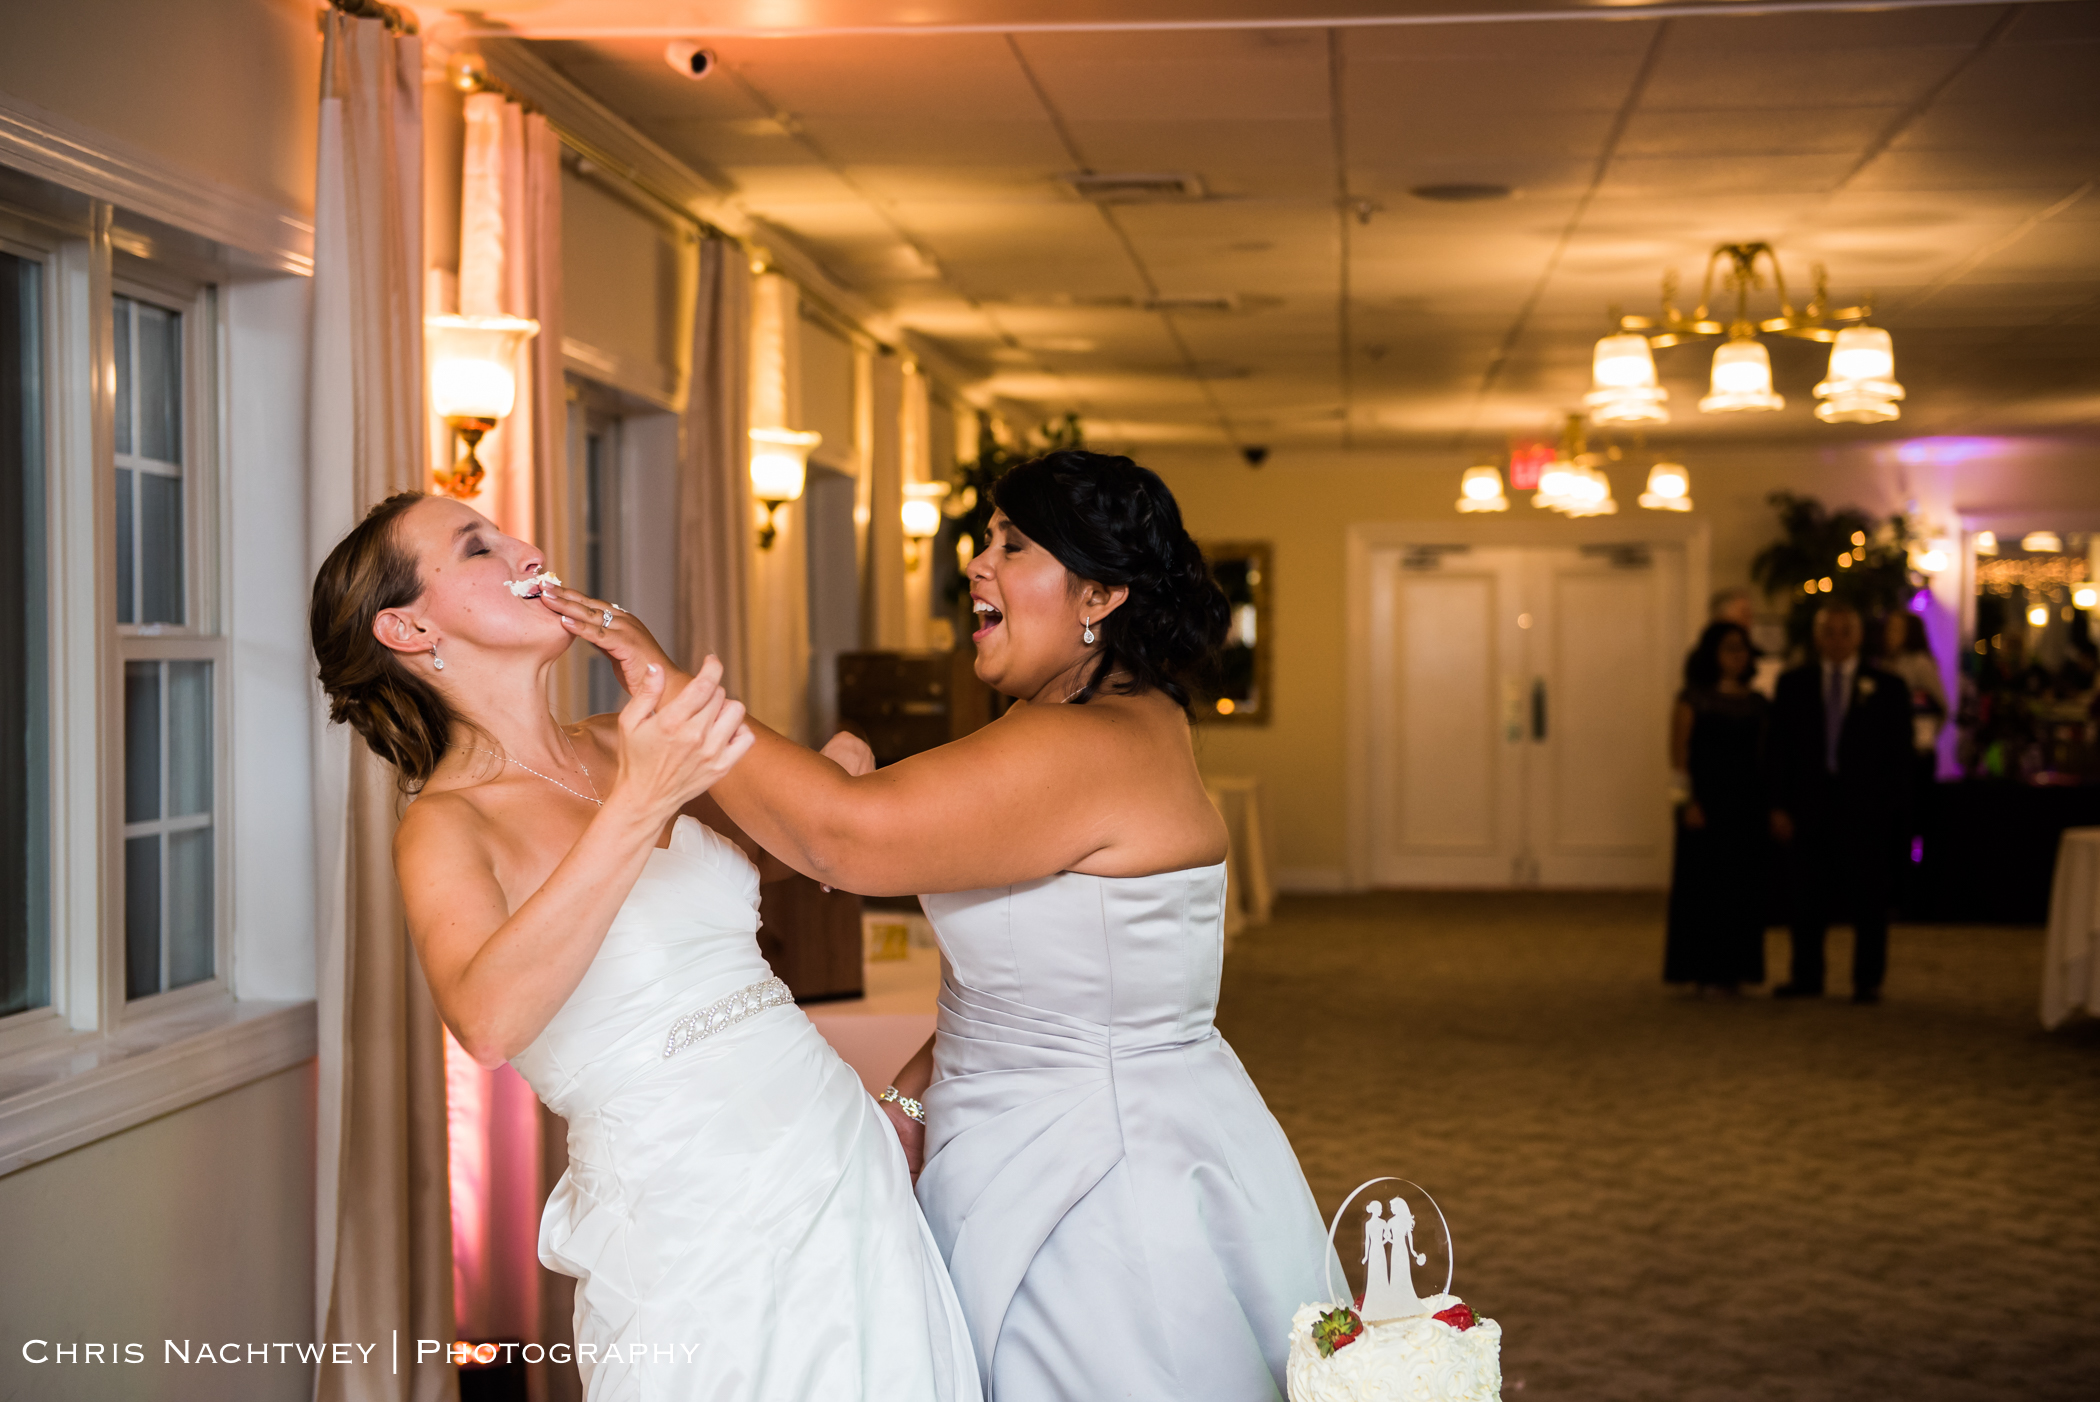 connecticut-same-sex-wedding-photographers-chris-nachtwey-2018-lisa-karina-38.jpg